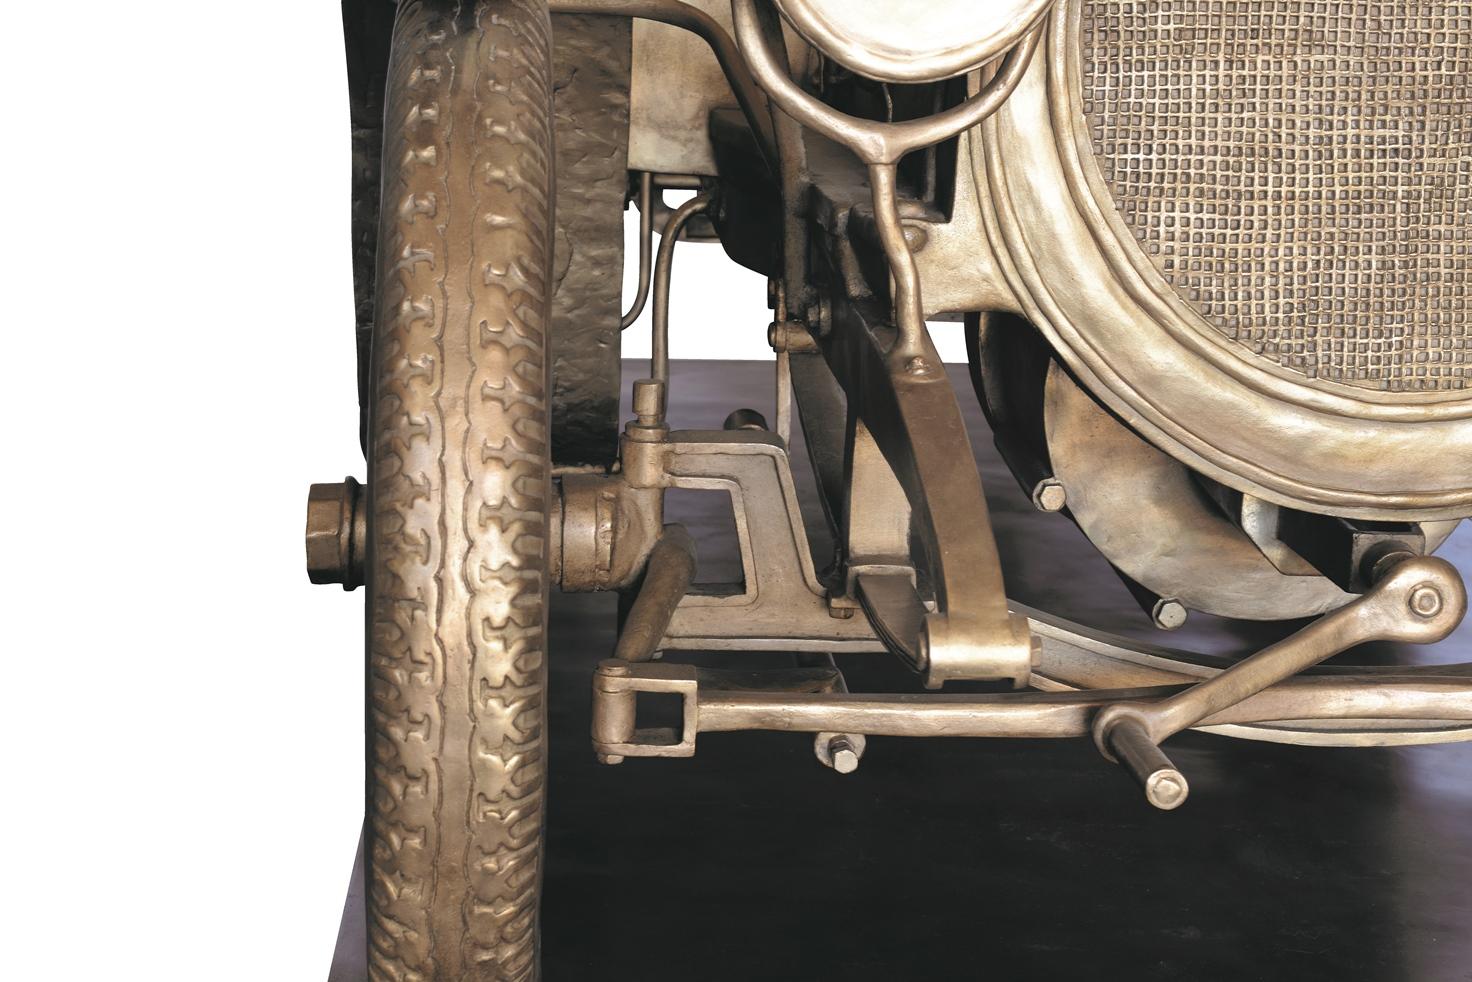 vintage car detail3 (2) sm